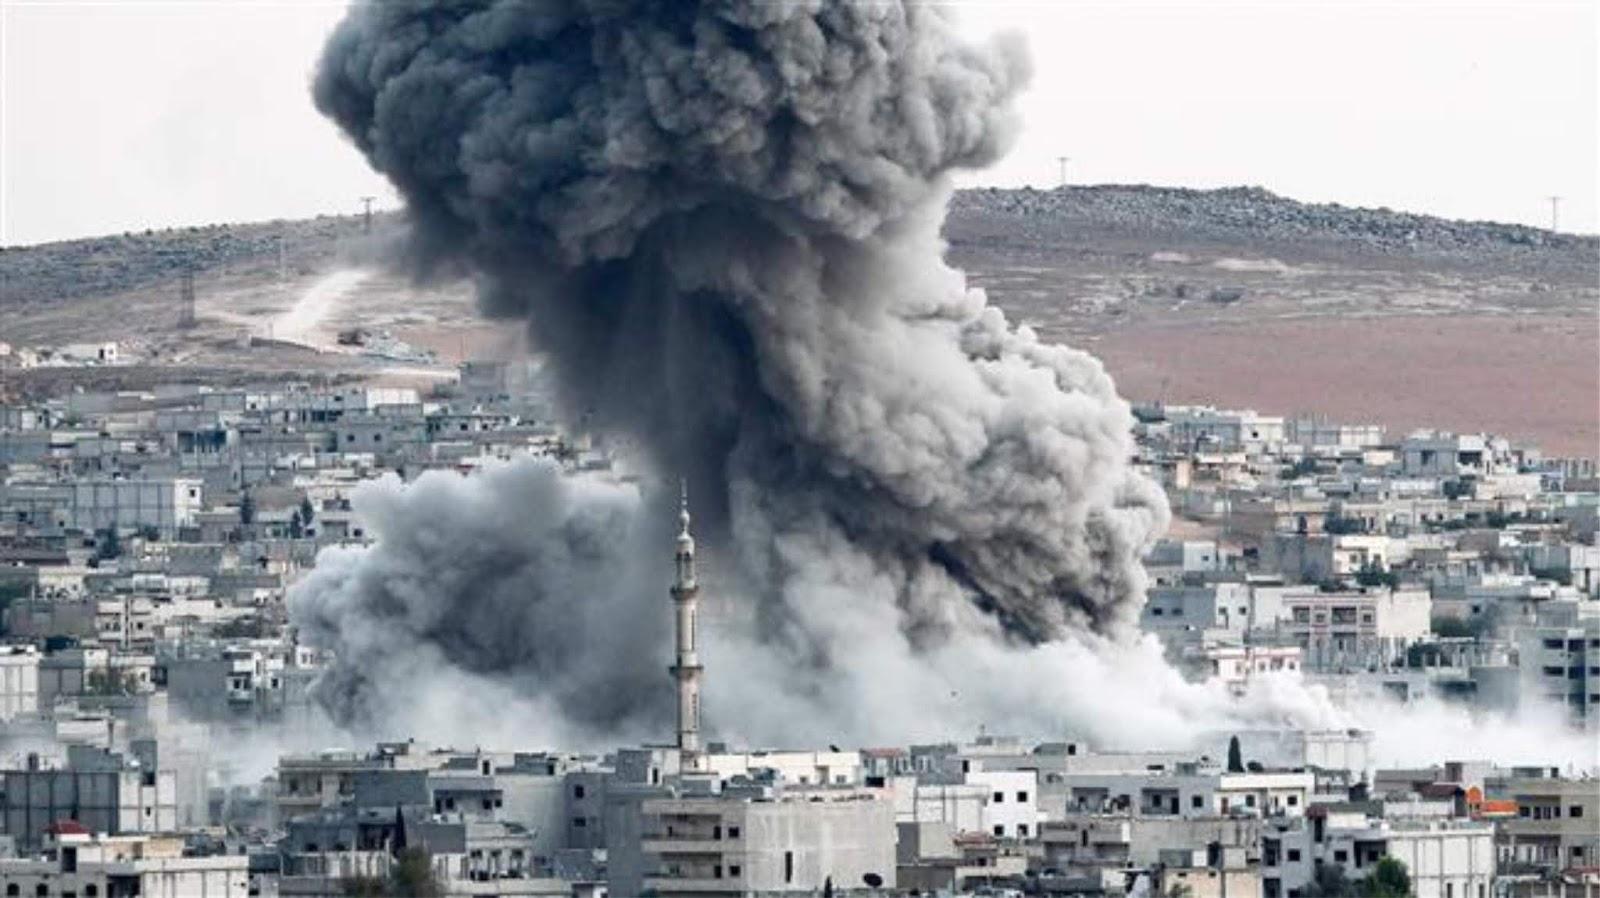 Kemhan Rusia militan di Aleppo menggunakan mortir kimia buatan sendiri